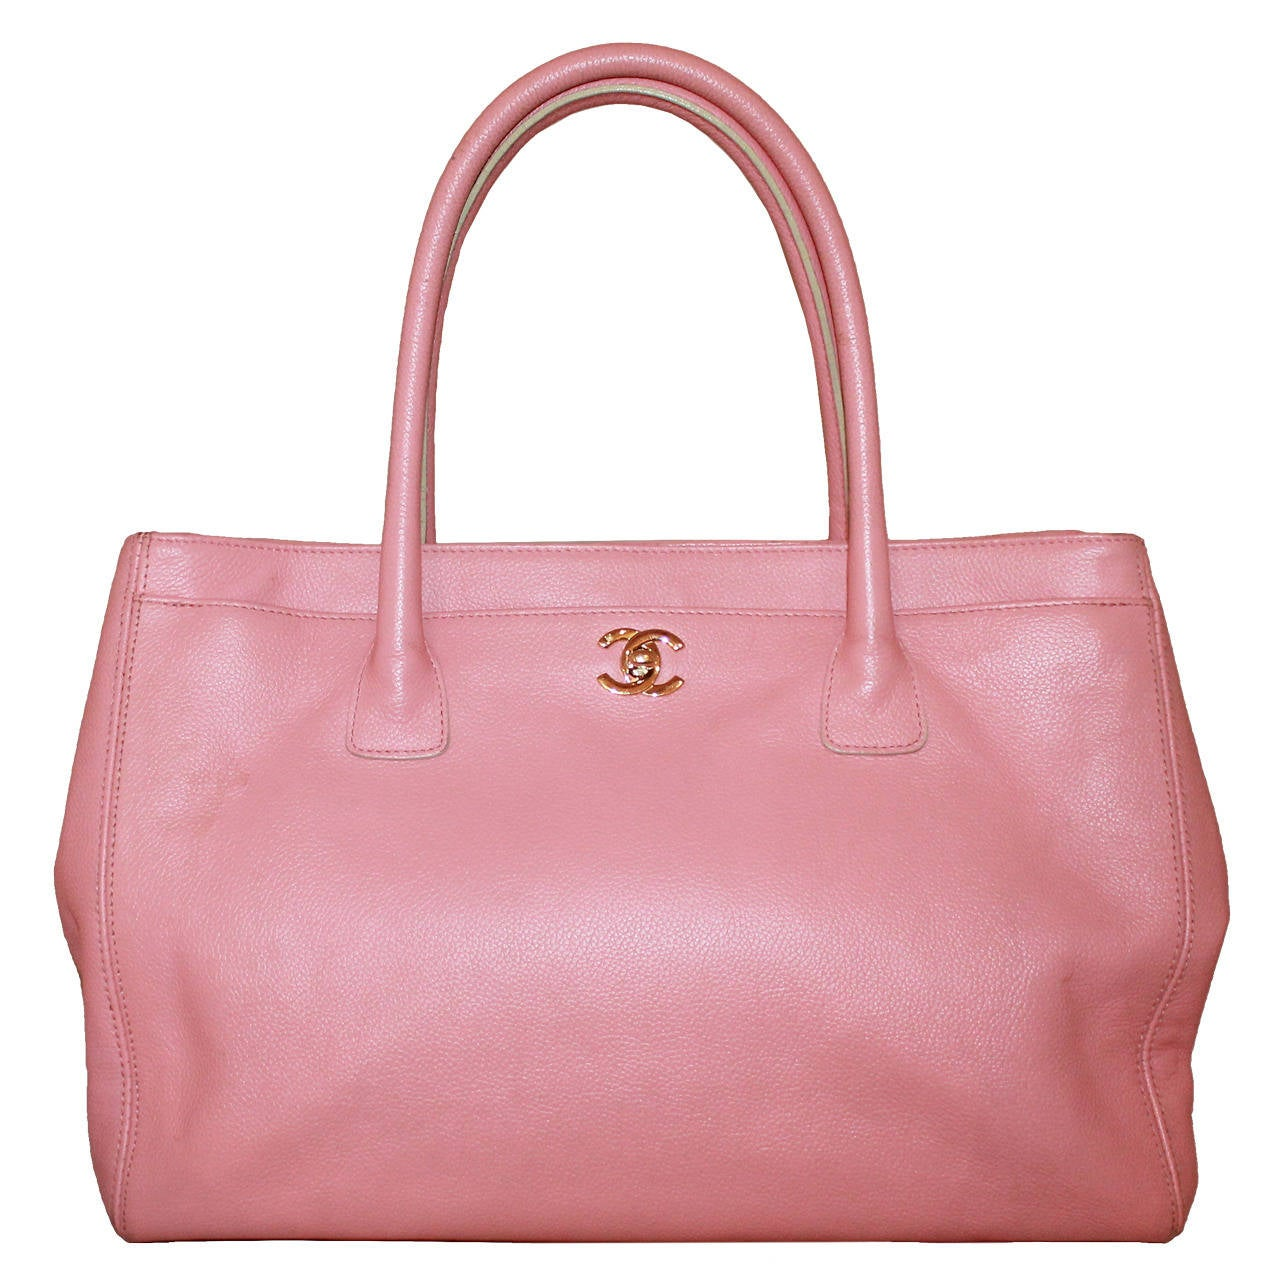 Chanel Vintage Pink Caviar Leather Tote - circa 2005 1